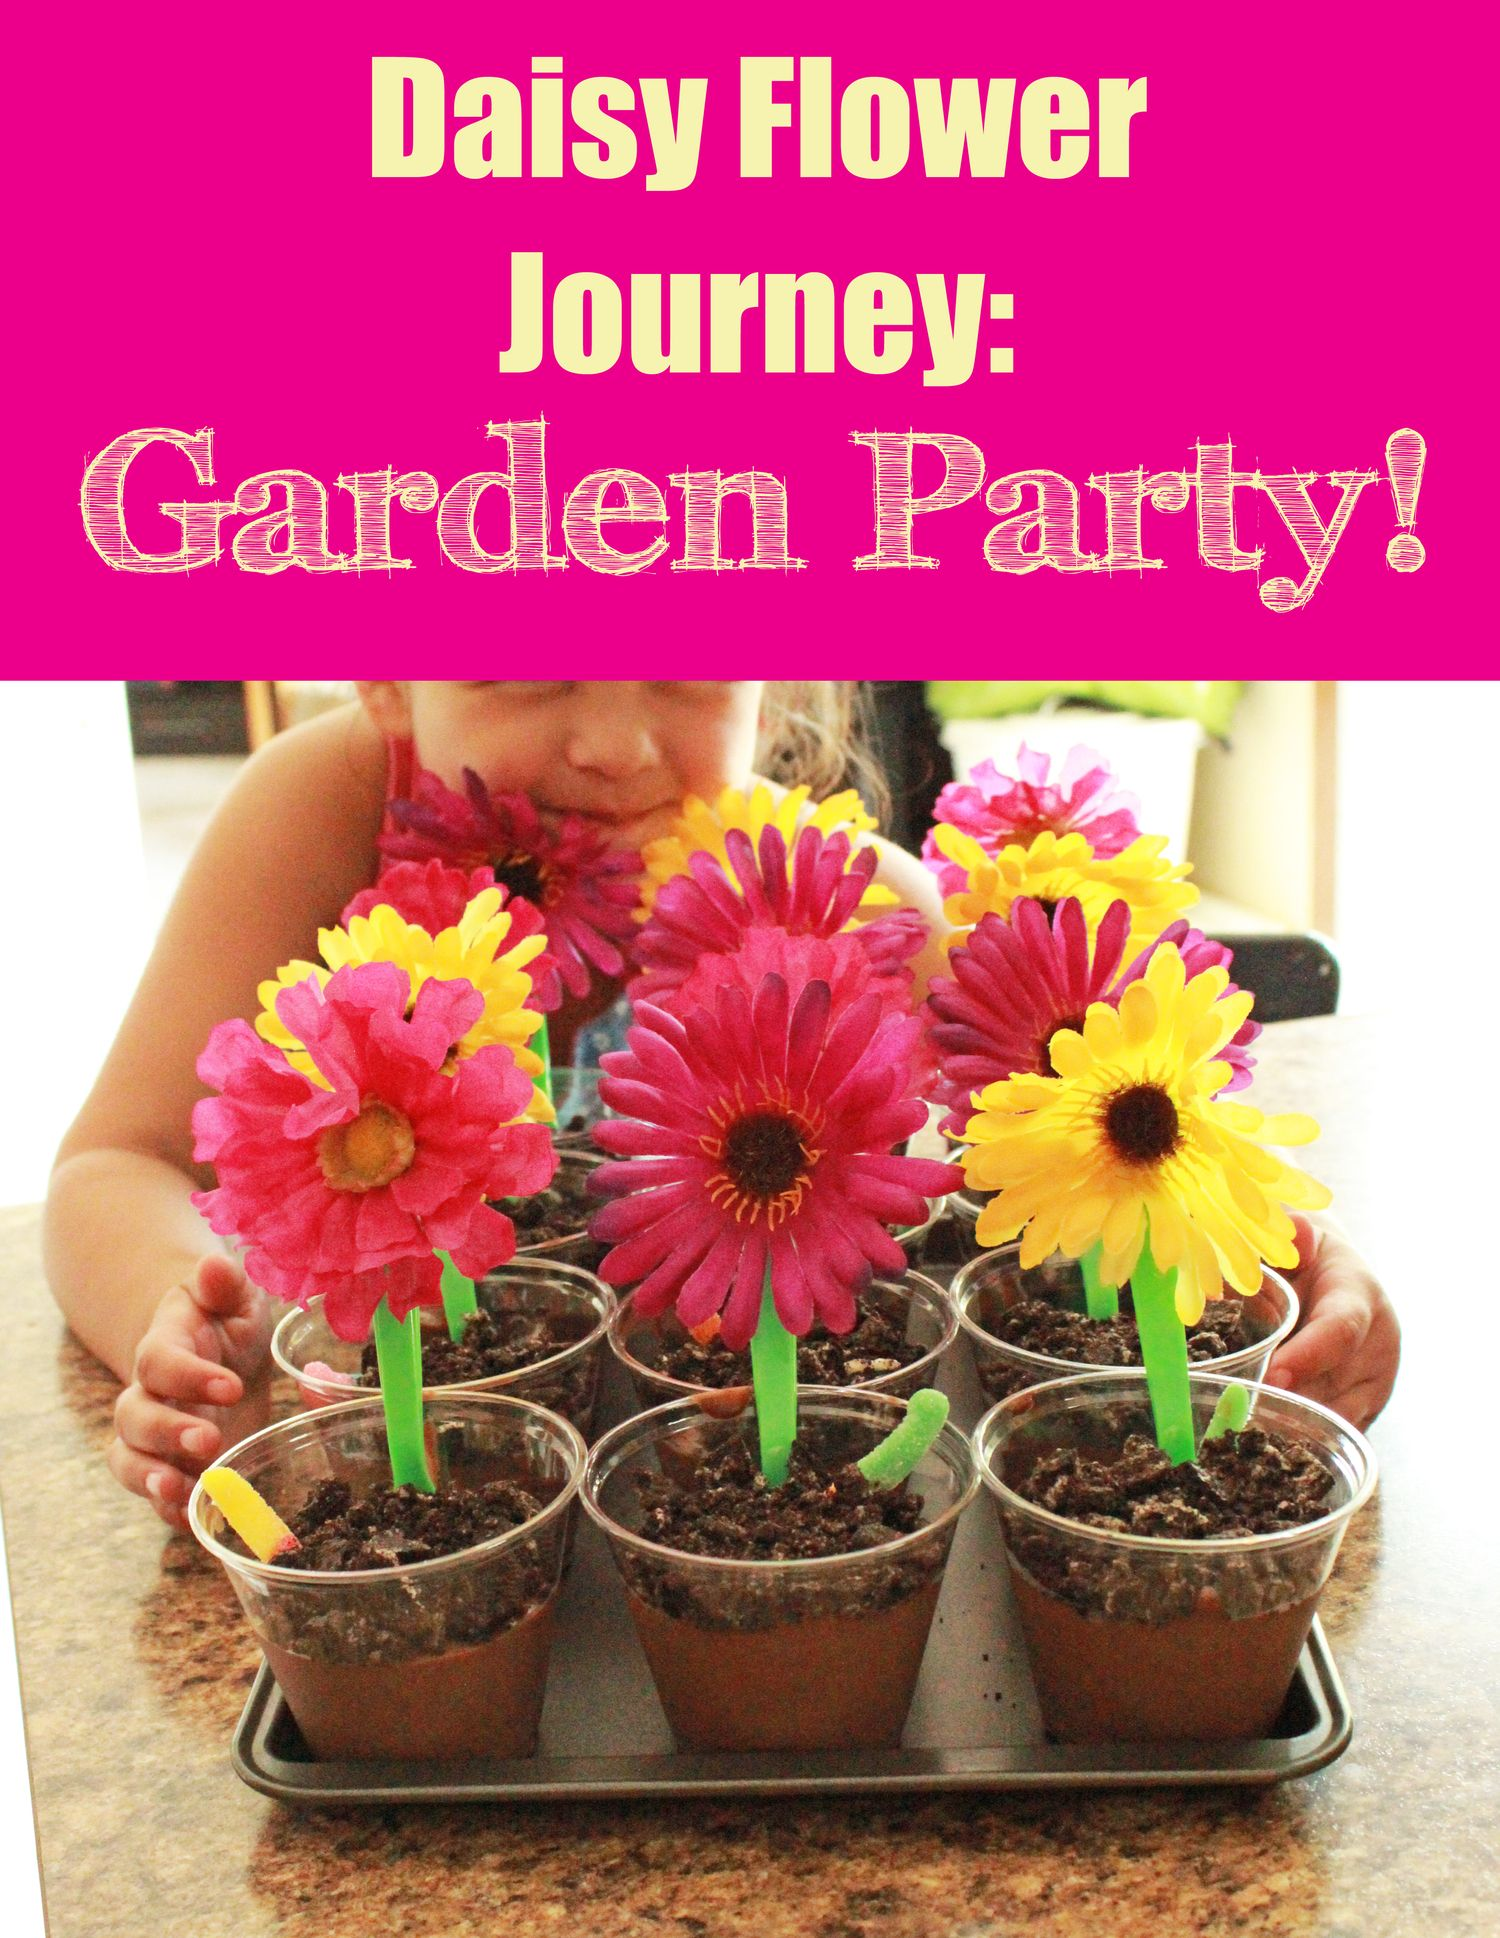 daisy flower garden journey: garden party!!!   girl scouts   daisy